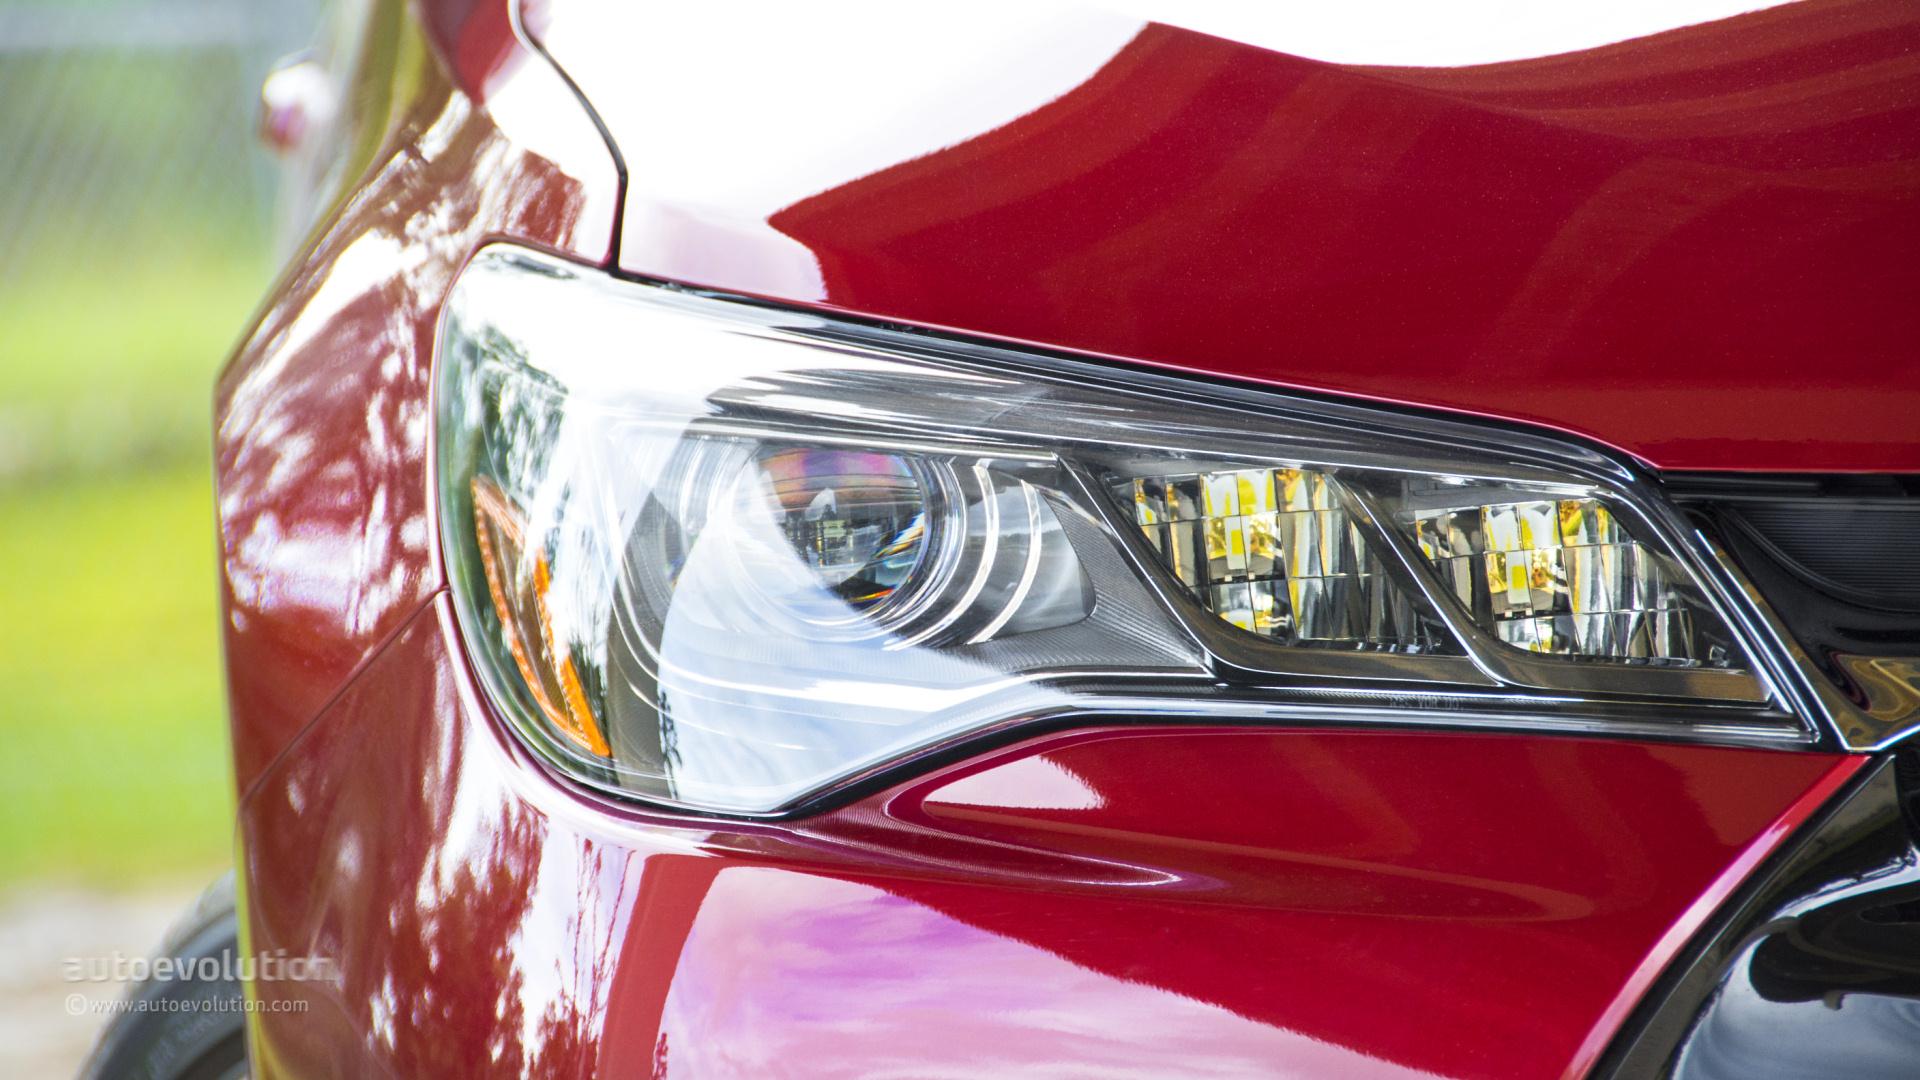 2015 toyota camry headlight size